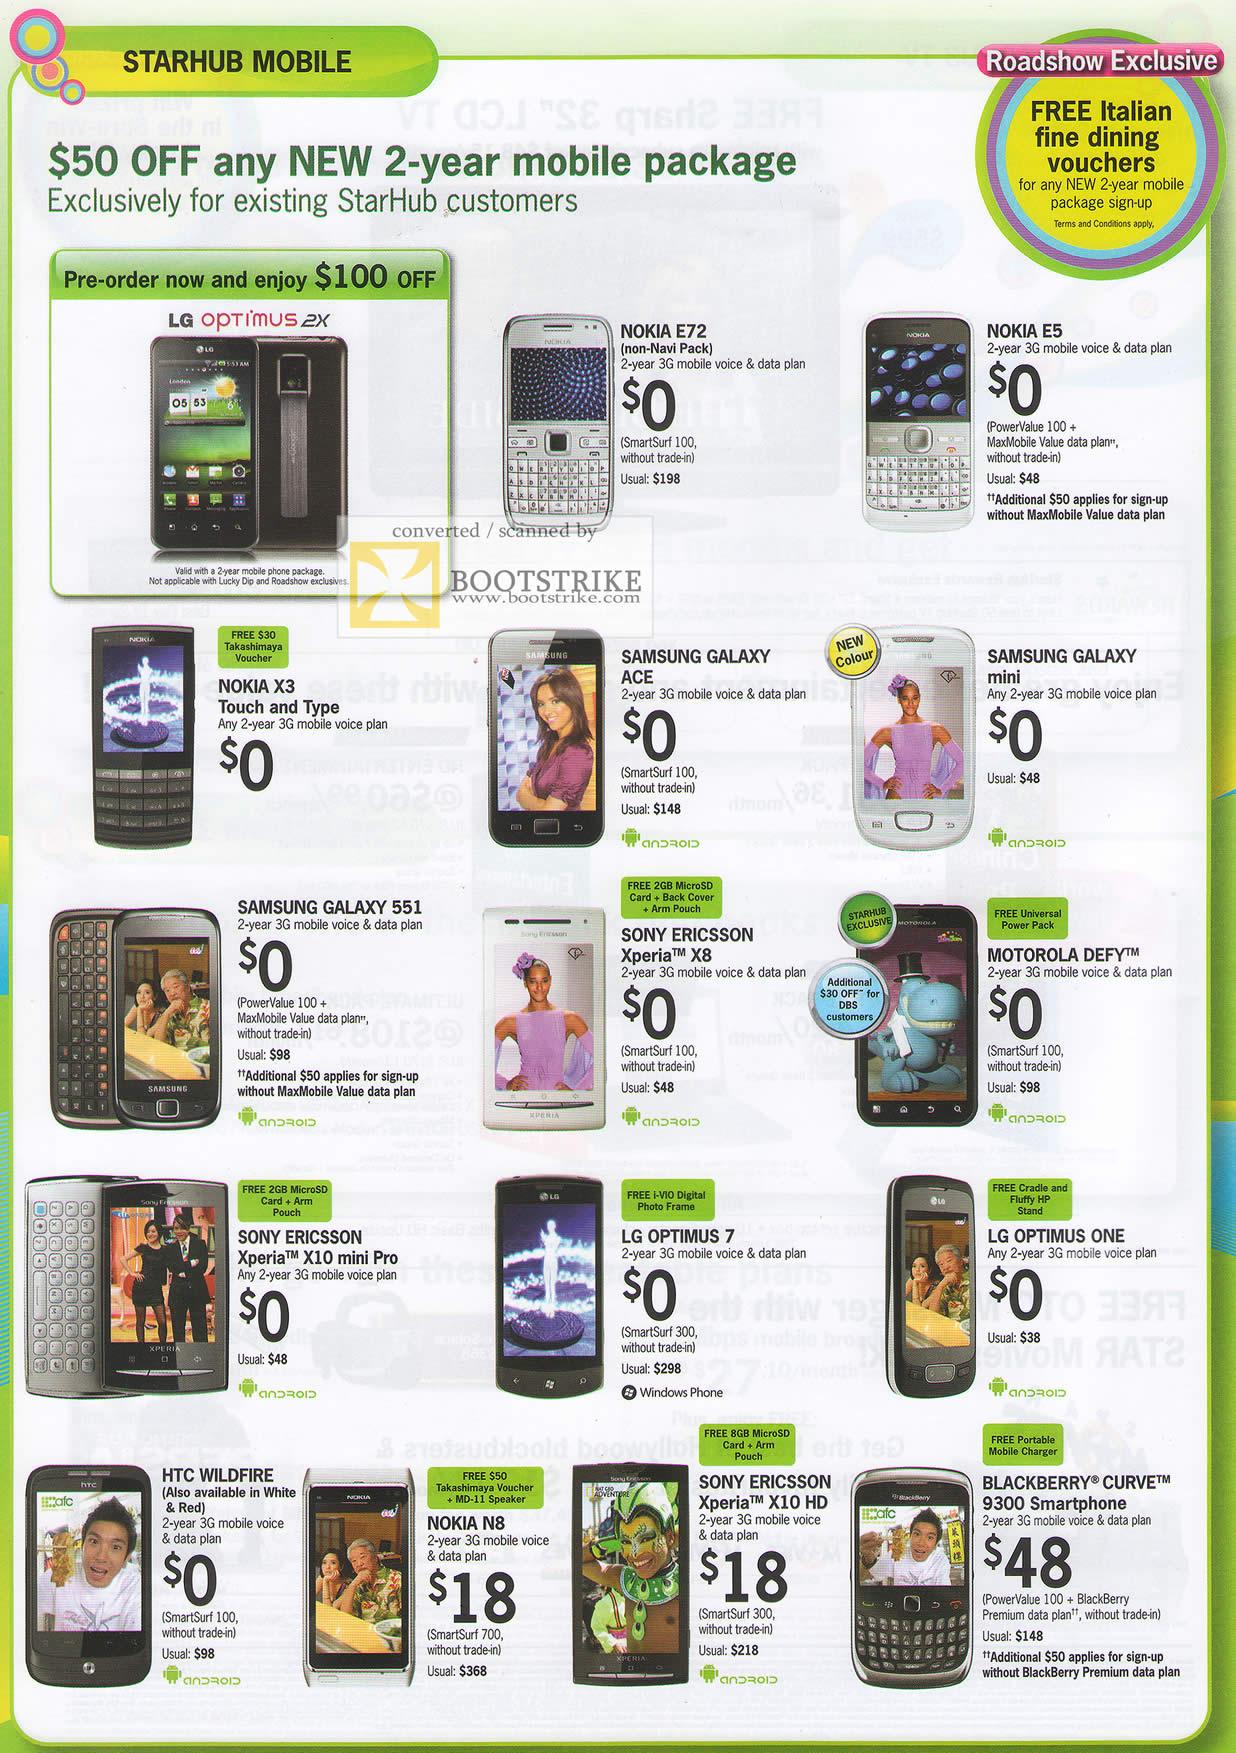 IT Show 2011 price list image brochure of Starhub Mobile Phones LG Optimus 2X Nokia E72 E5 X3 Samsung Sony Ericsson Motorola Defy Xperia LG Sony Ericsson BlackBerry